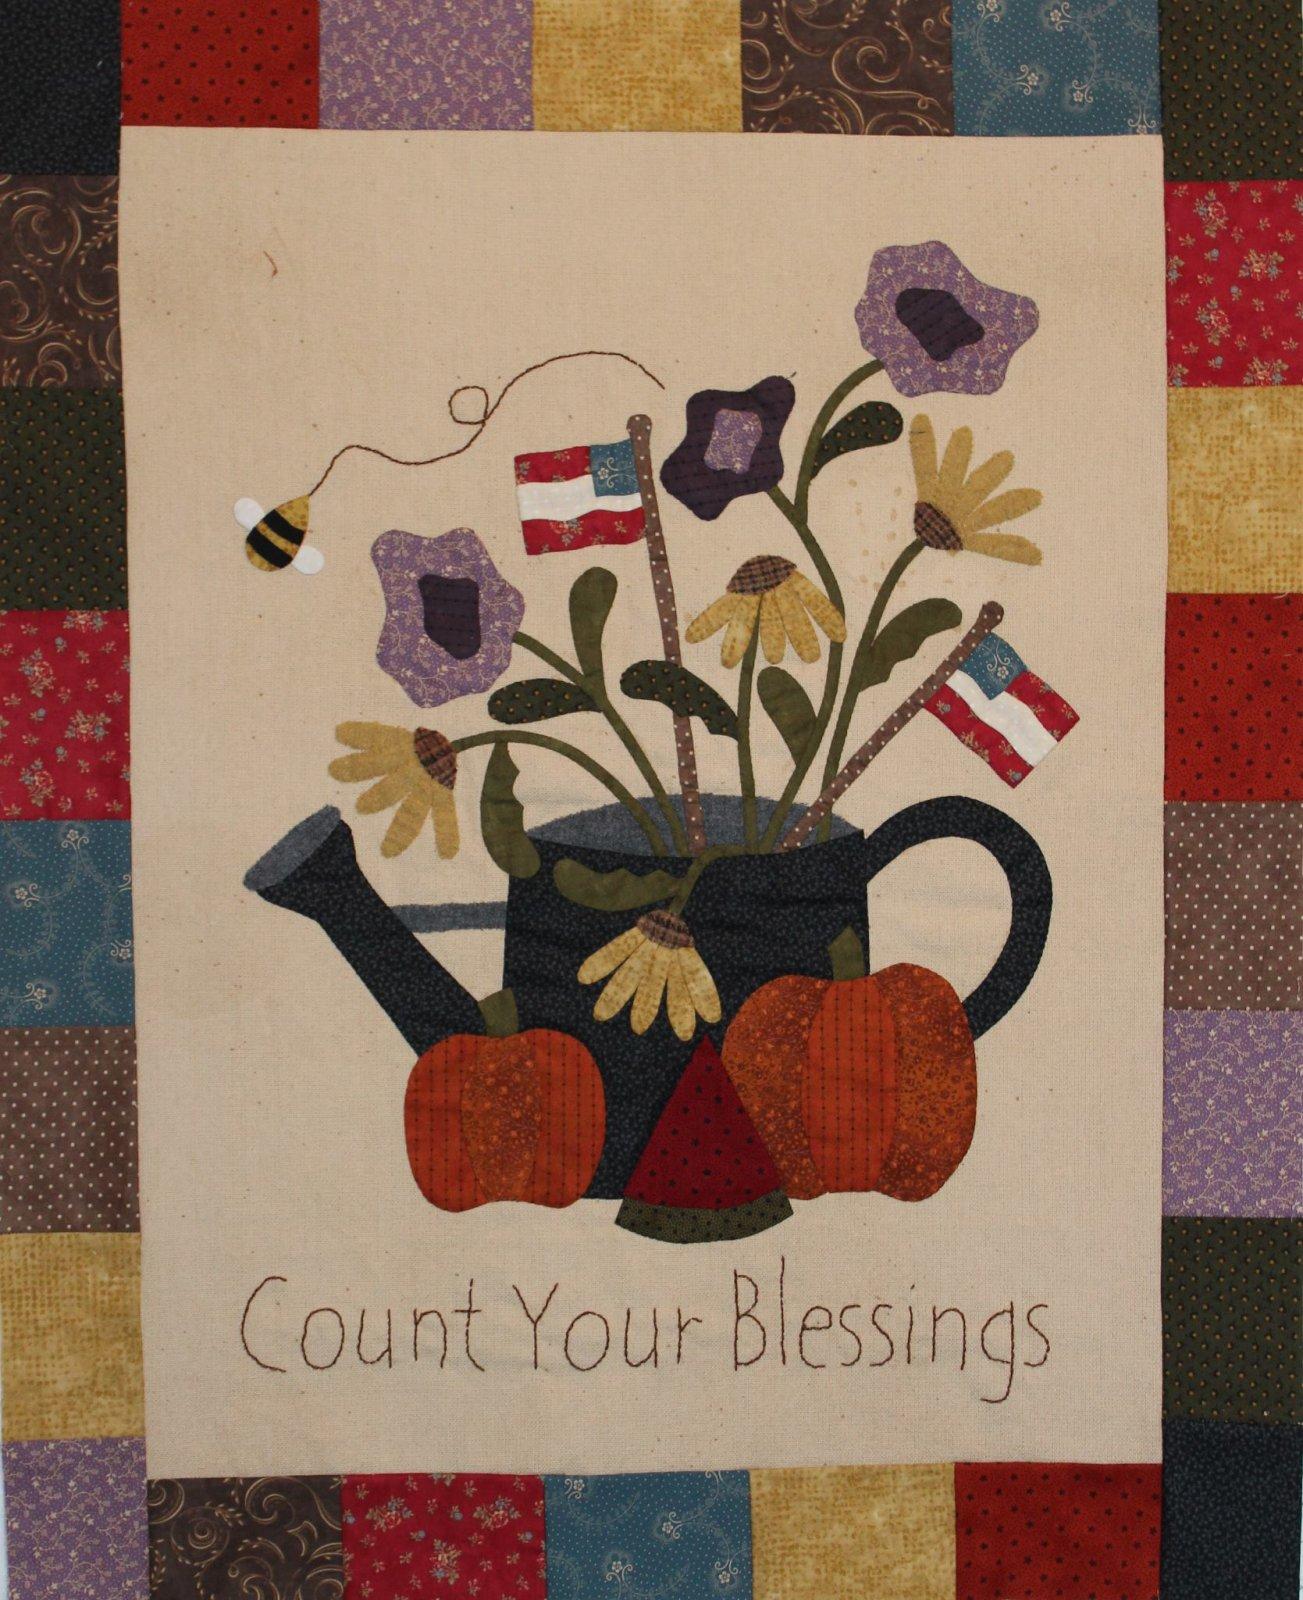 Count Your Blessings by Lisa Van Gronegin